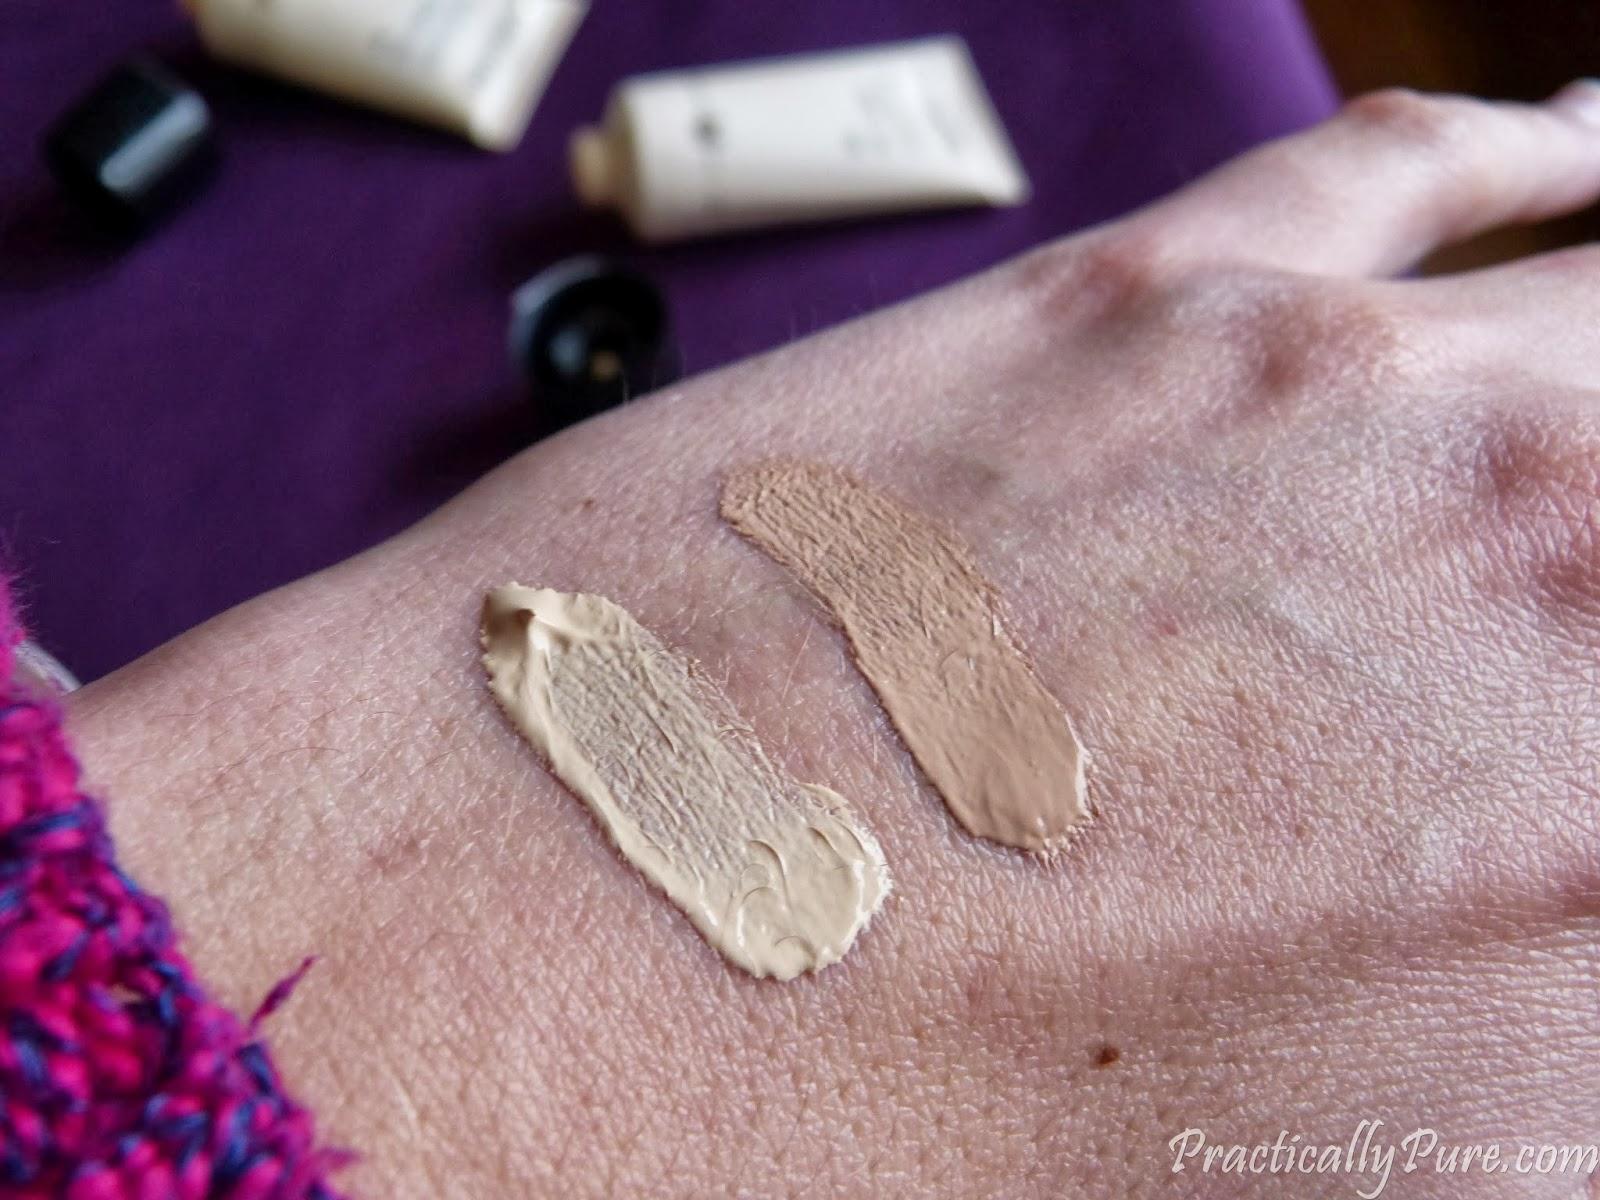 Swatch Dr Hauschka Translucent Foundation Porcelaine en Pale Sand